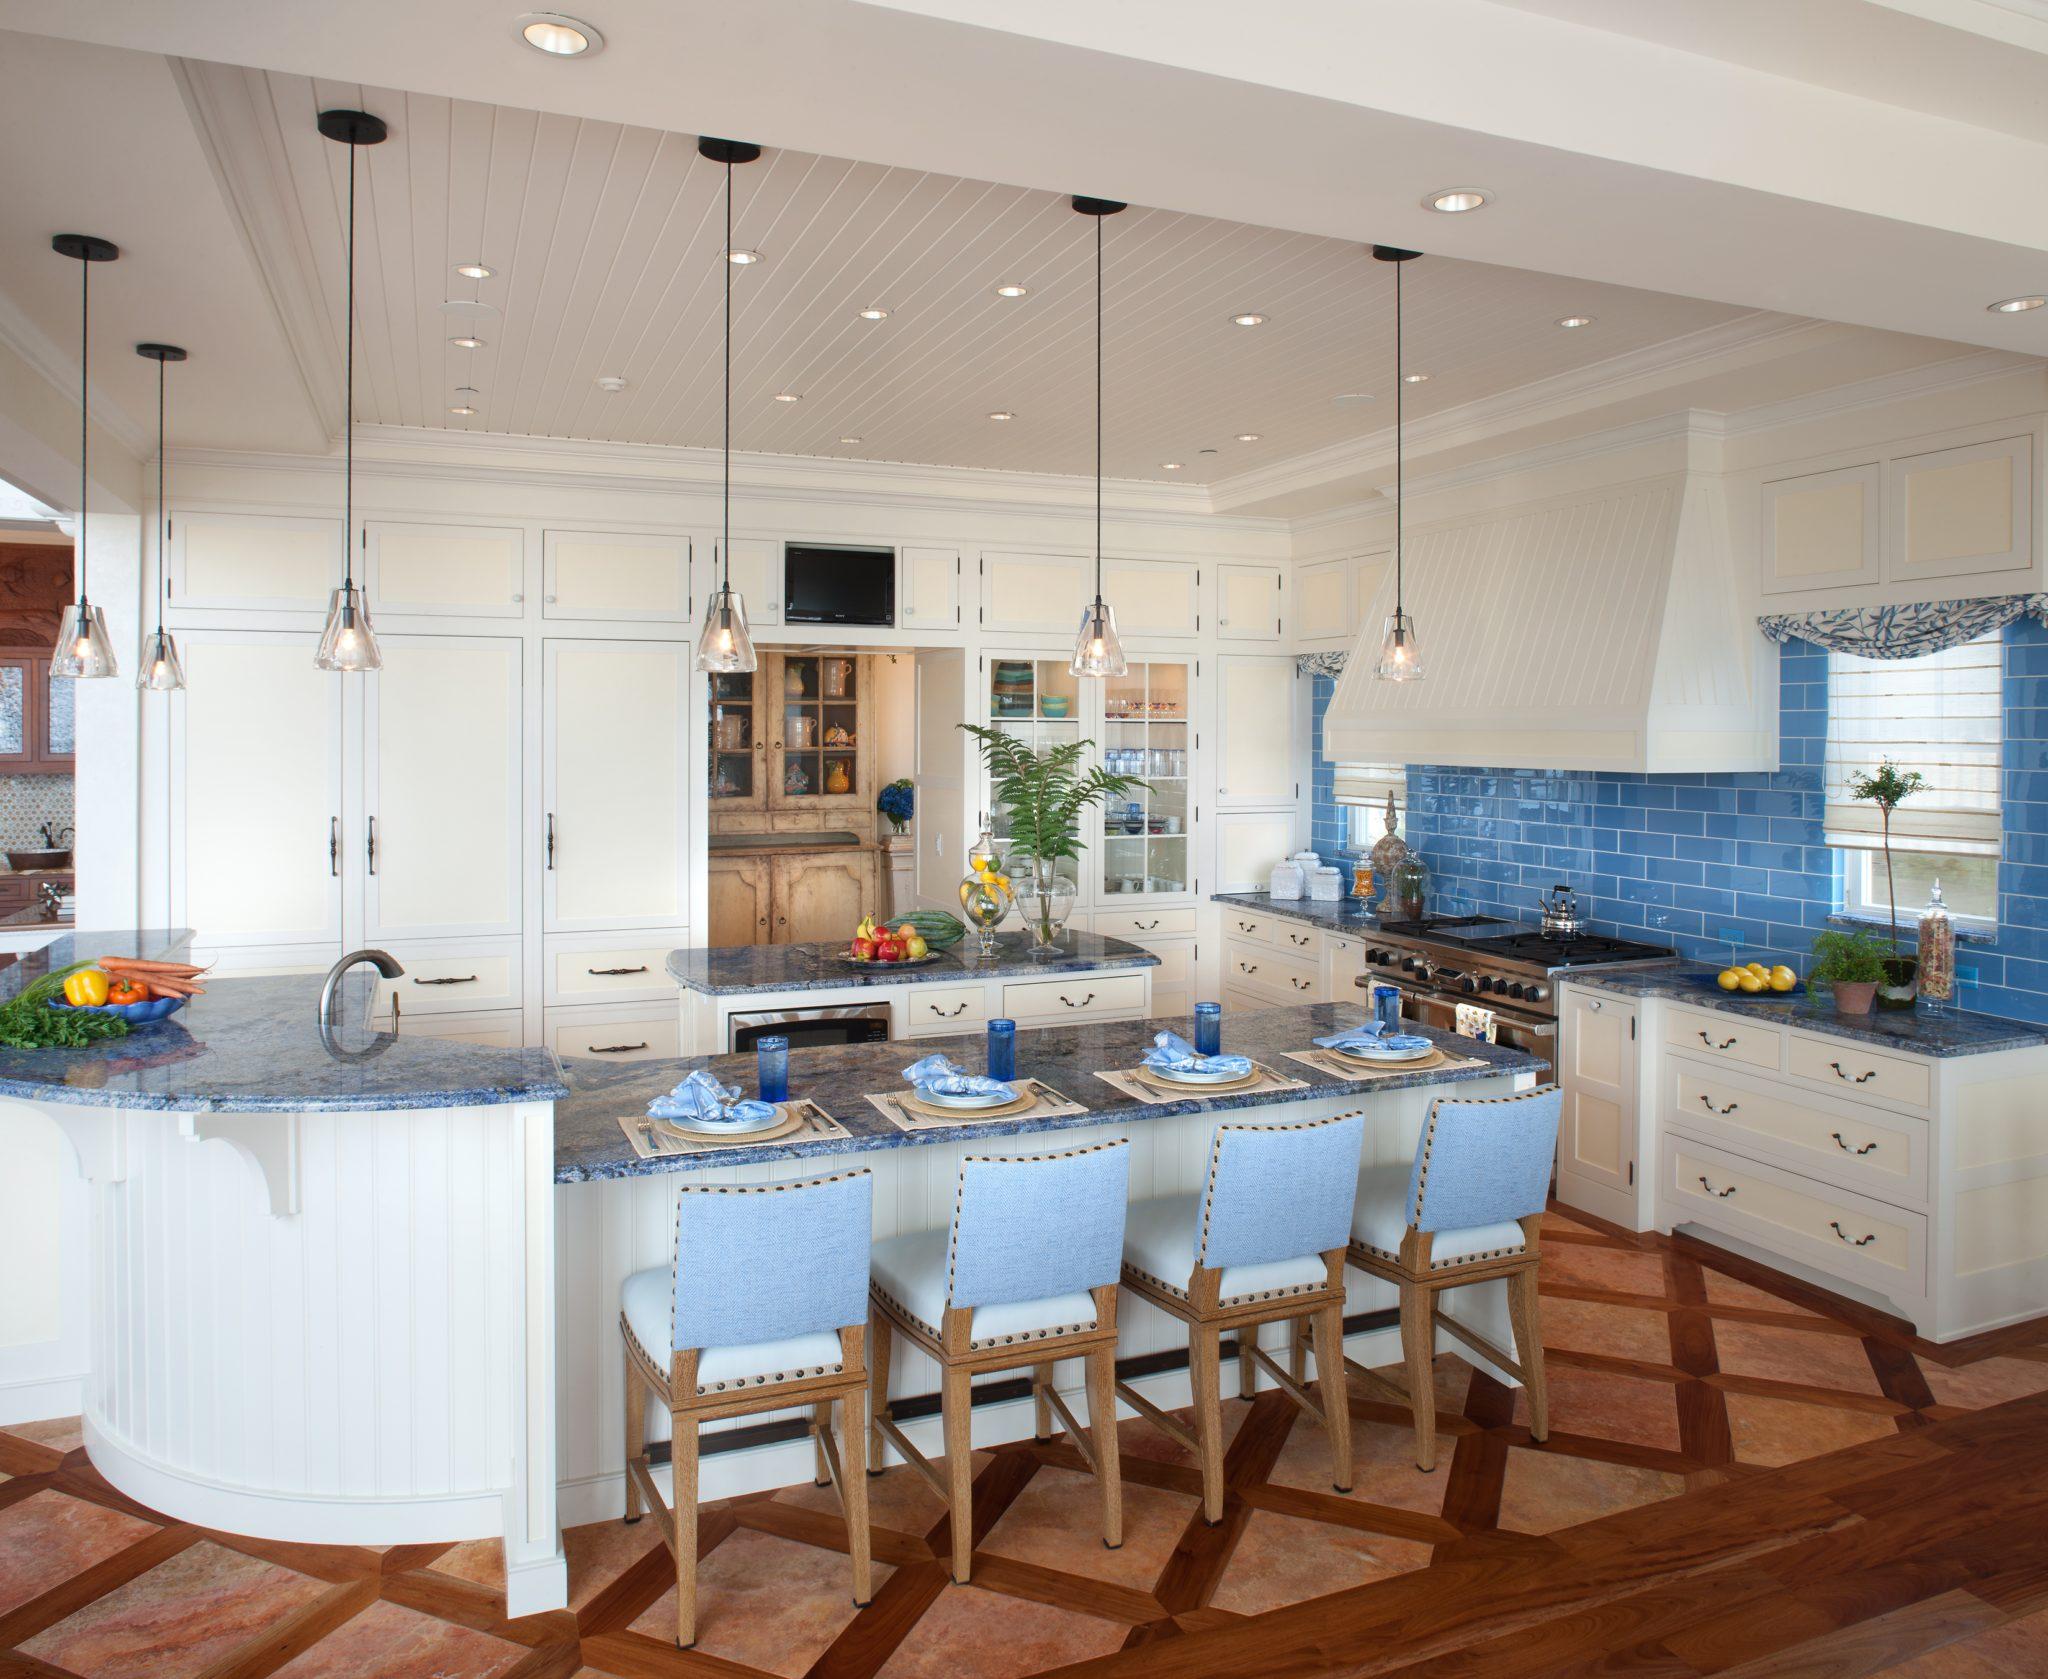 Interior design by Bruce Palmer Design Studio